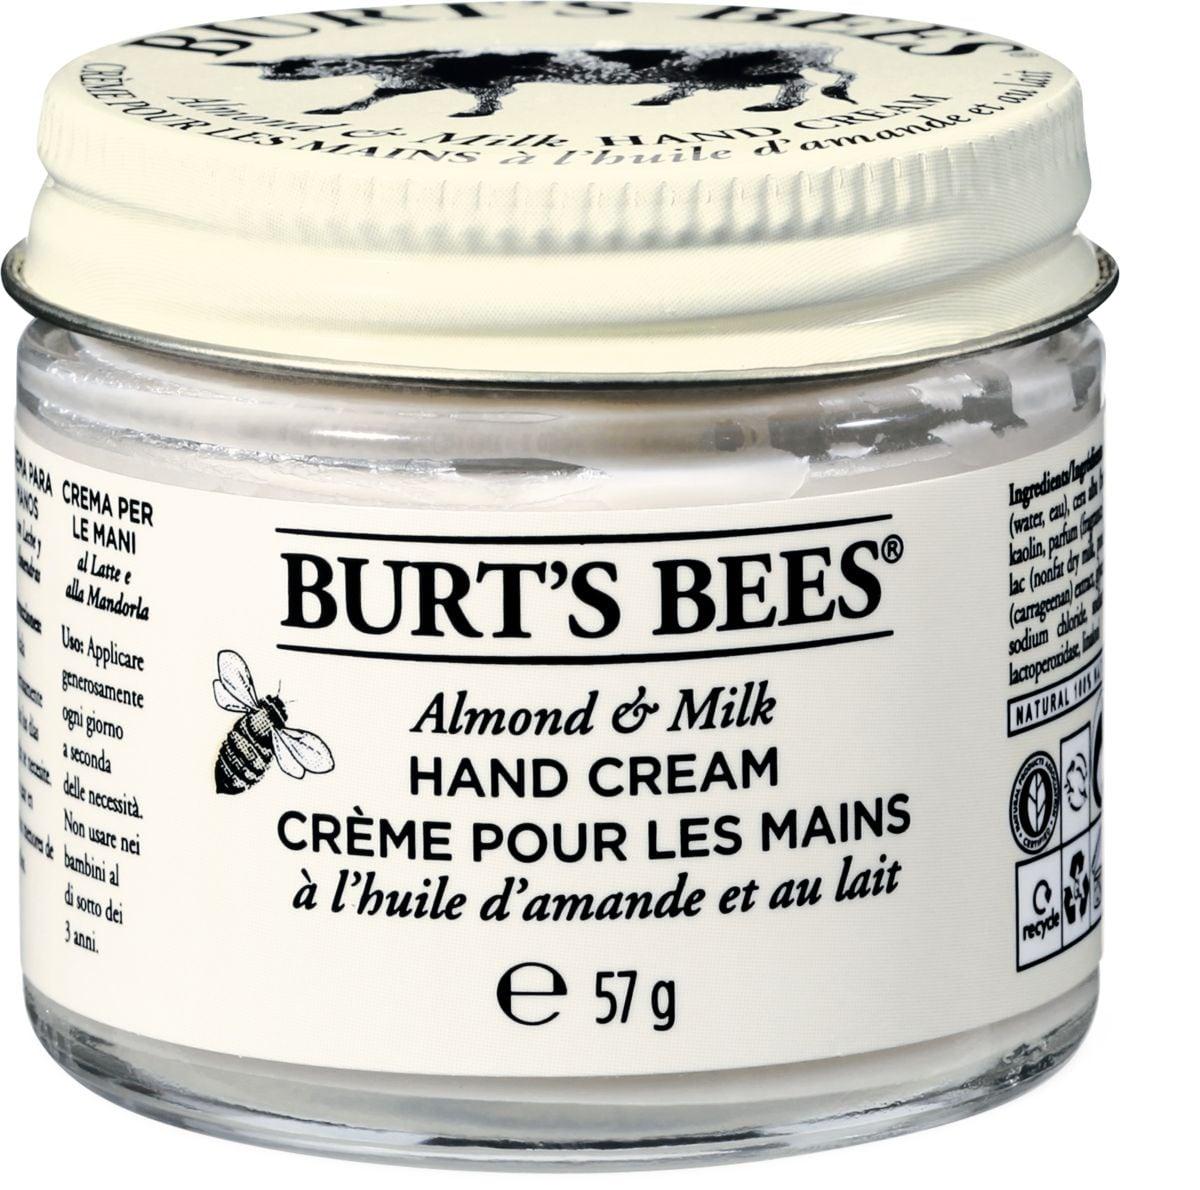 Burt's Bees HC Almond Milk Bees